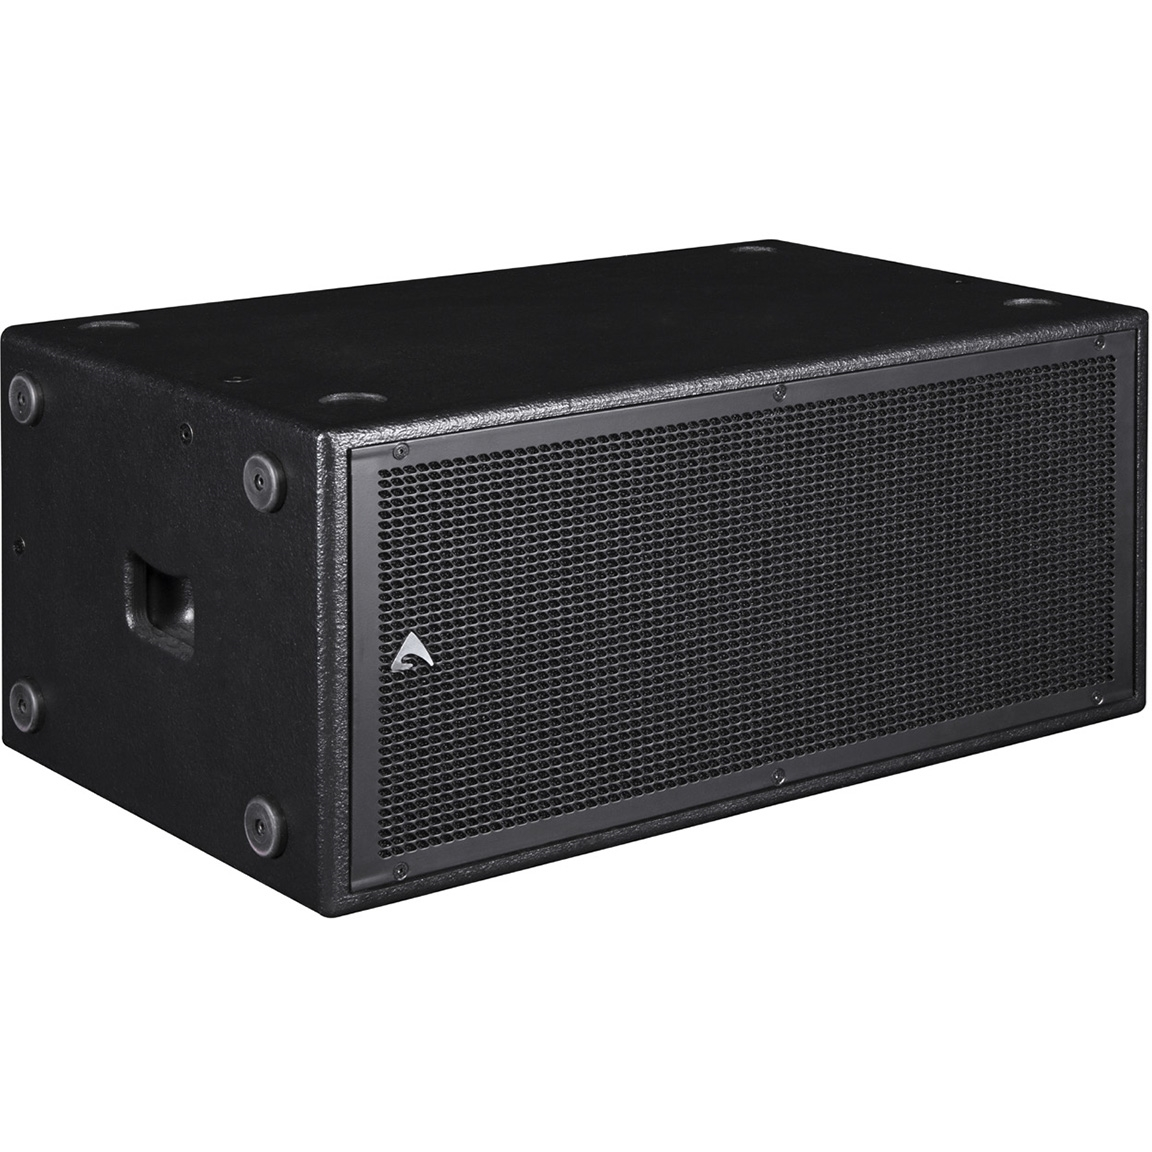 Axiom SW210P - Пассивный сабвуфер 2 х 10'', 2х350 – 2х700 – 2х1200 Вт, черного цвета